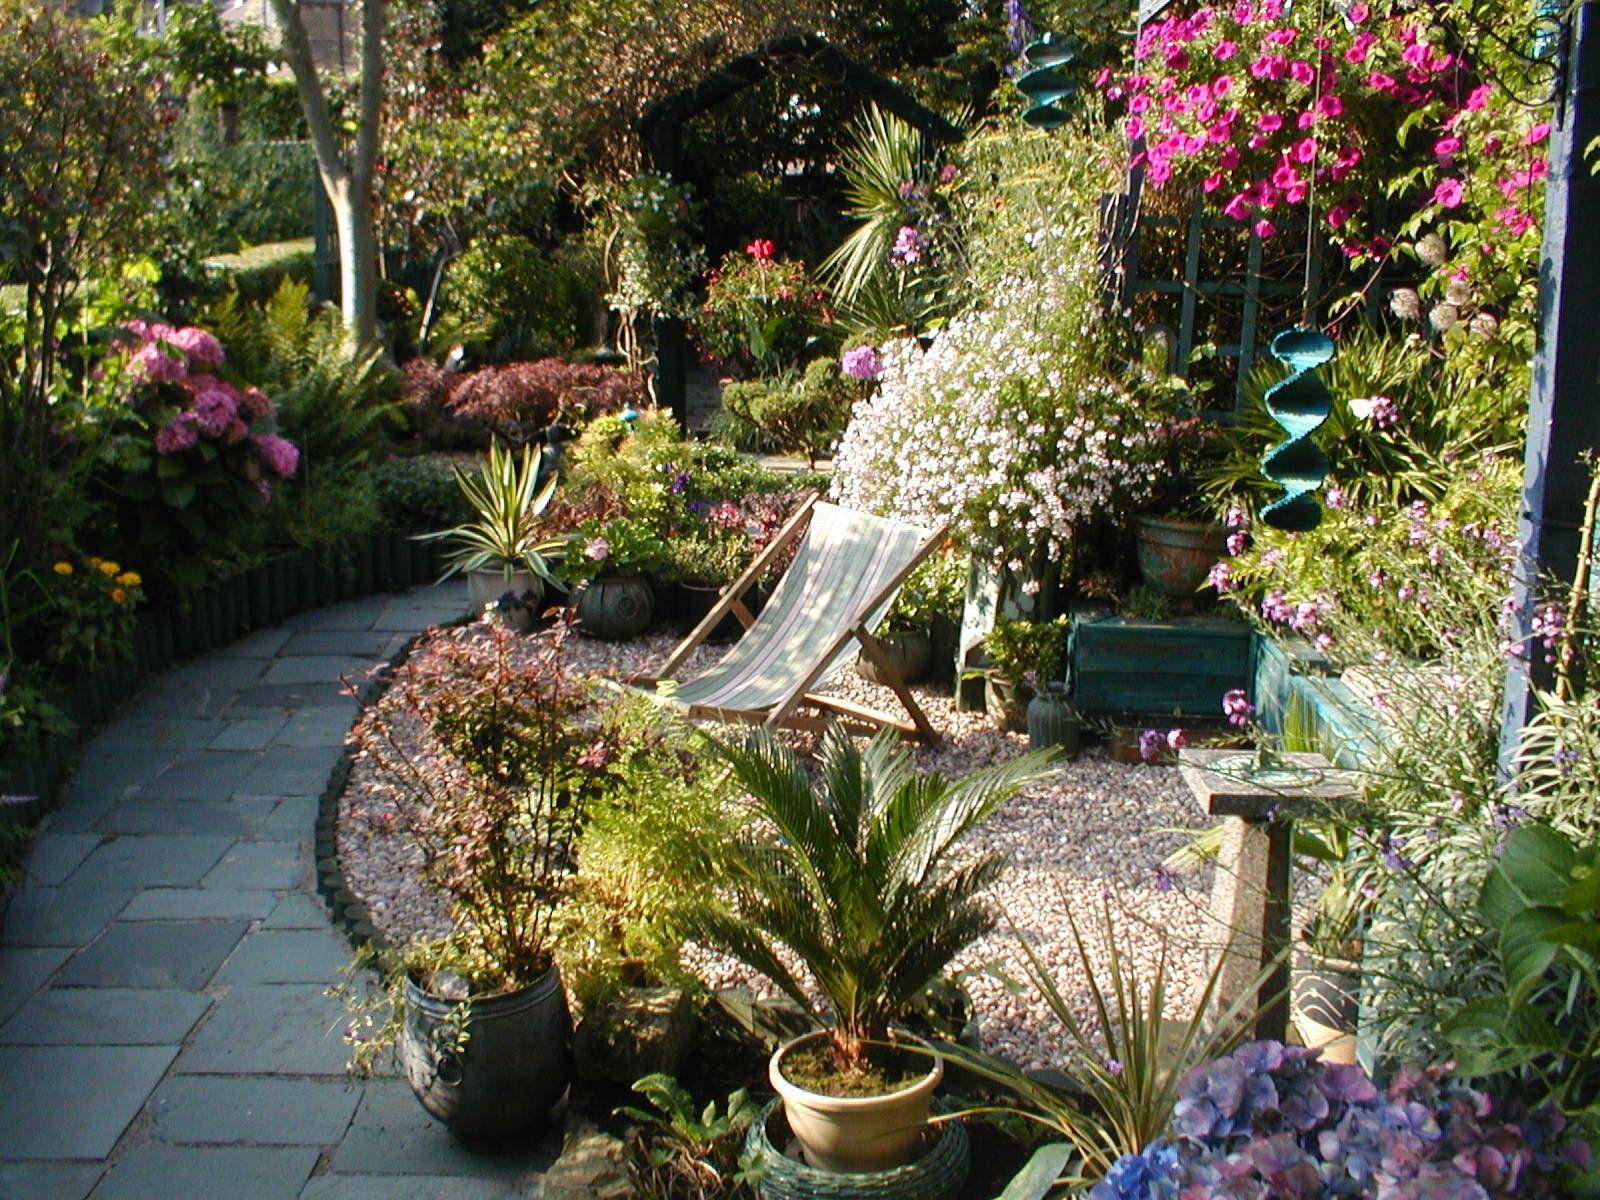 explore long and thingardening gardens backyard